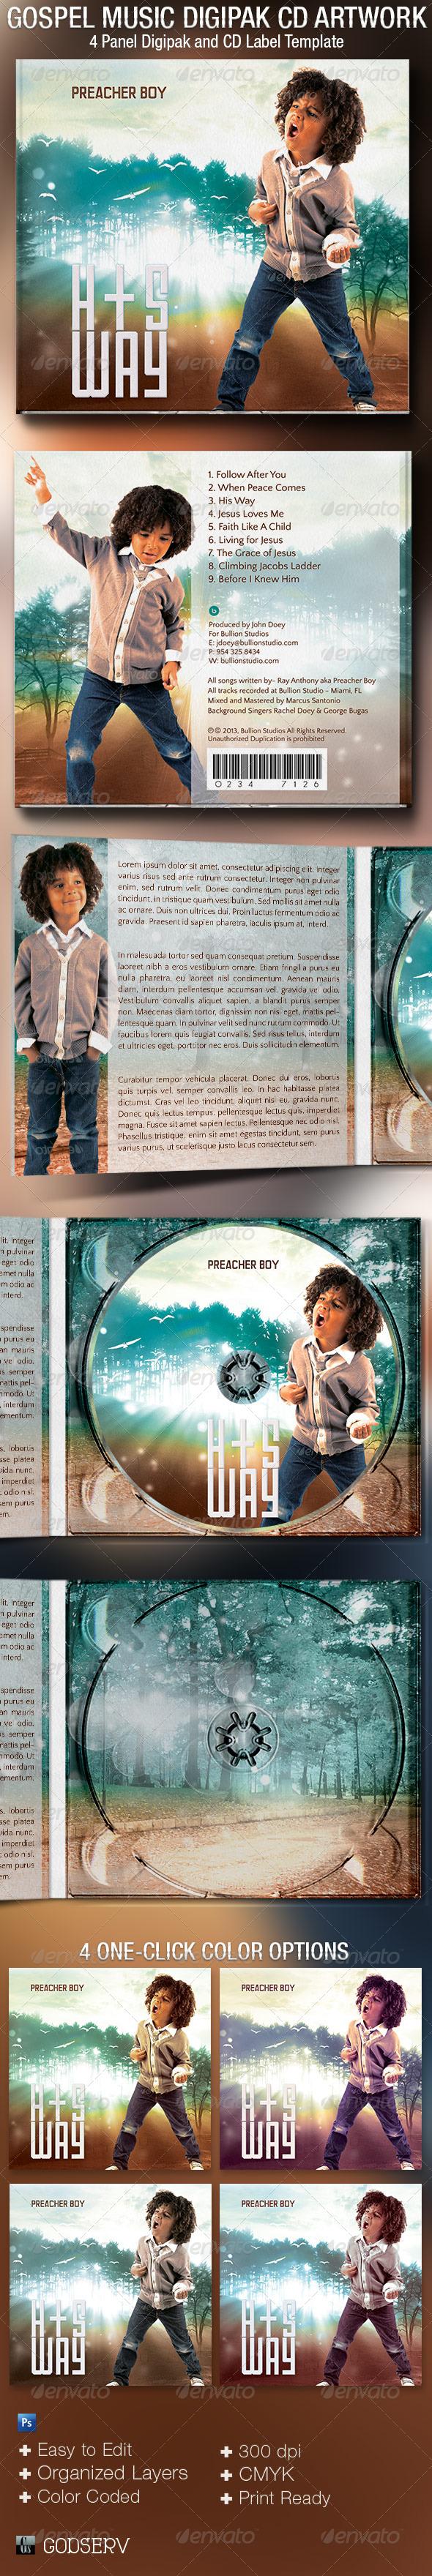 Gospel Music 4 Panel Digipak CD Artwork Template - CD & DVD Artwork Print Templates